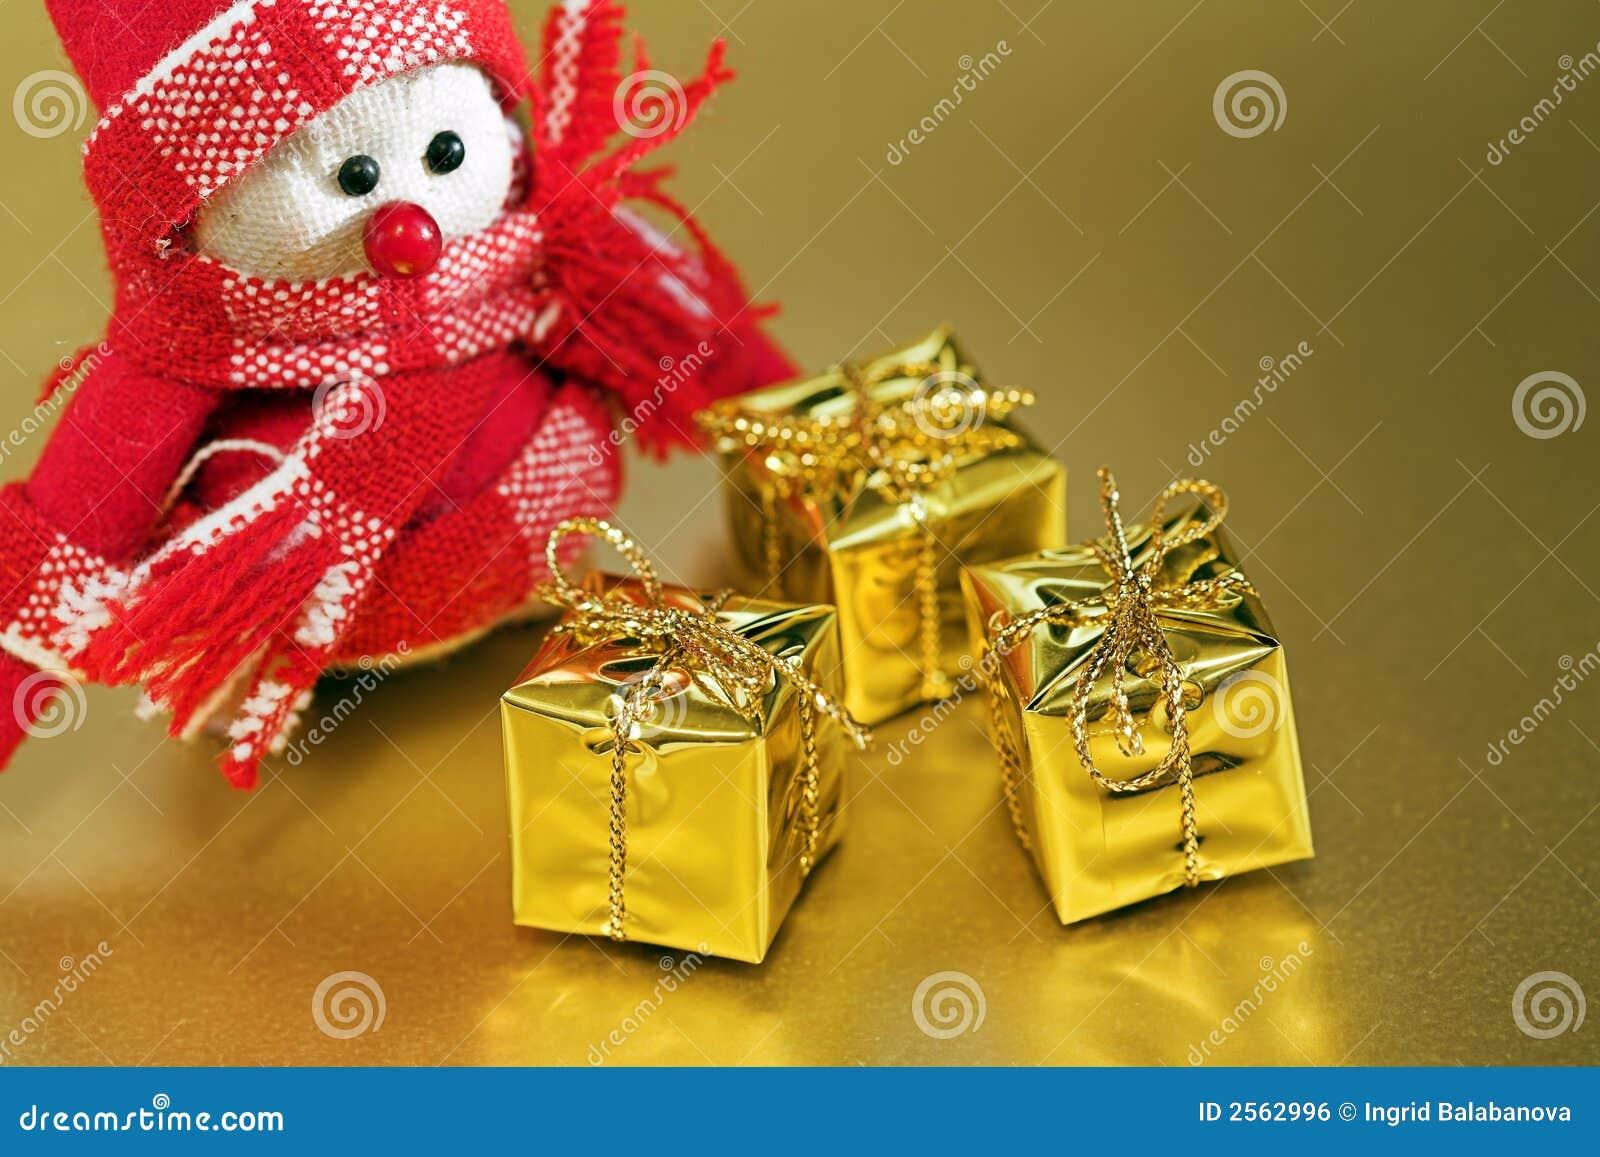 Christmas Motive Royalty Free Stock Image Image 2562996